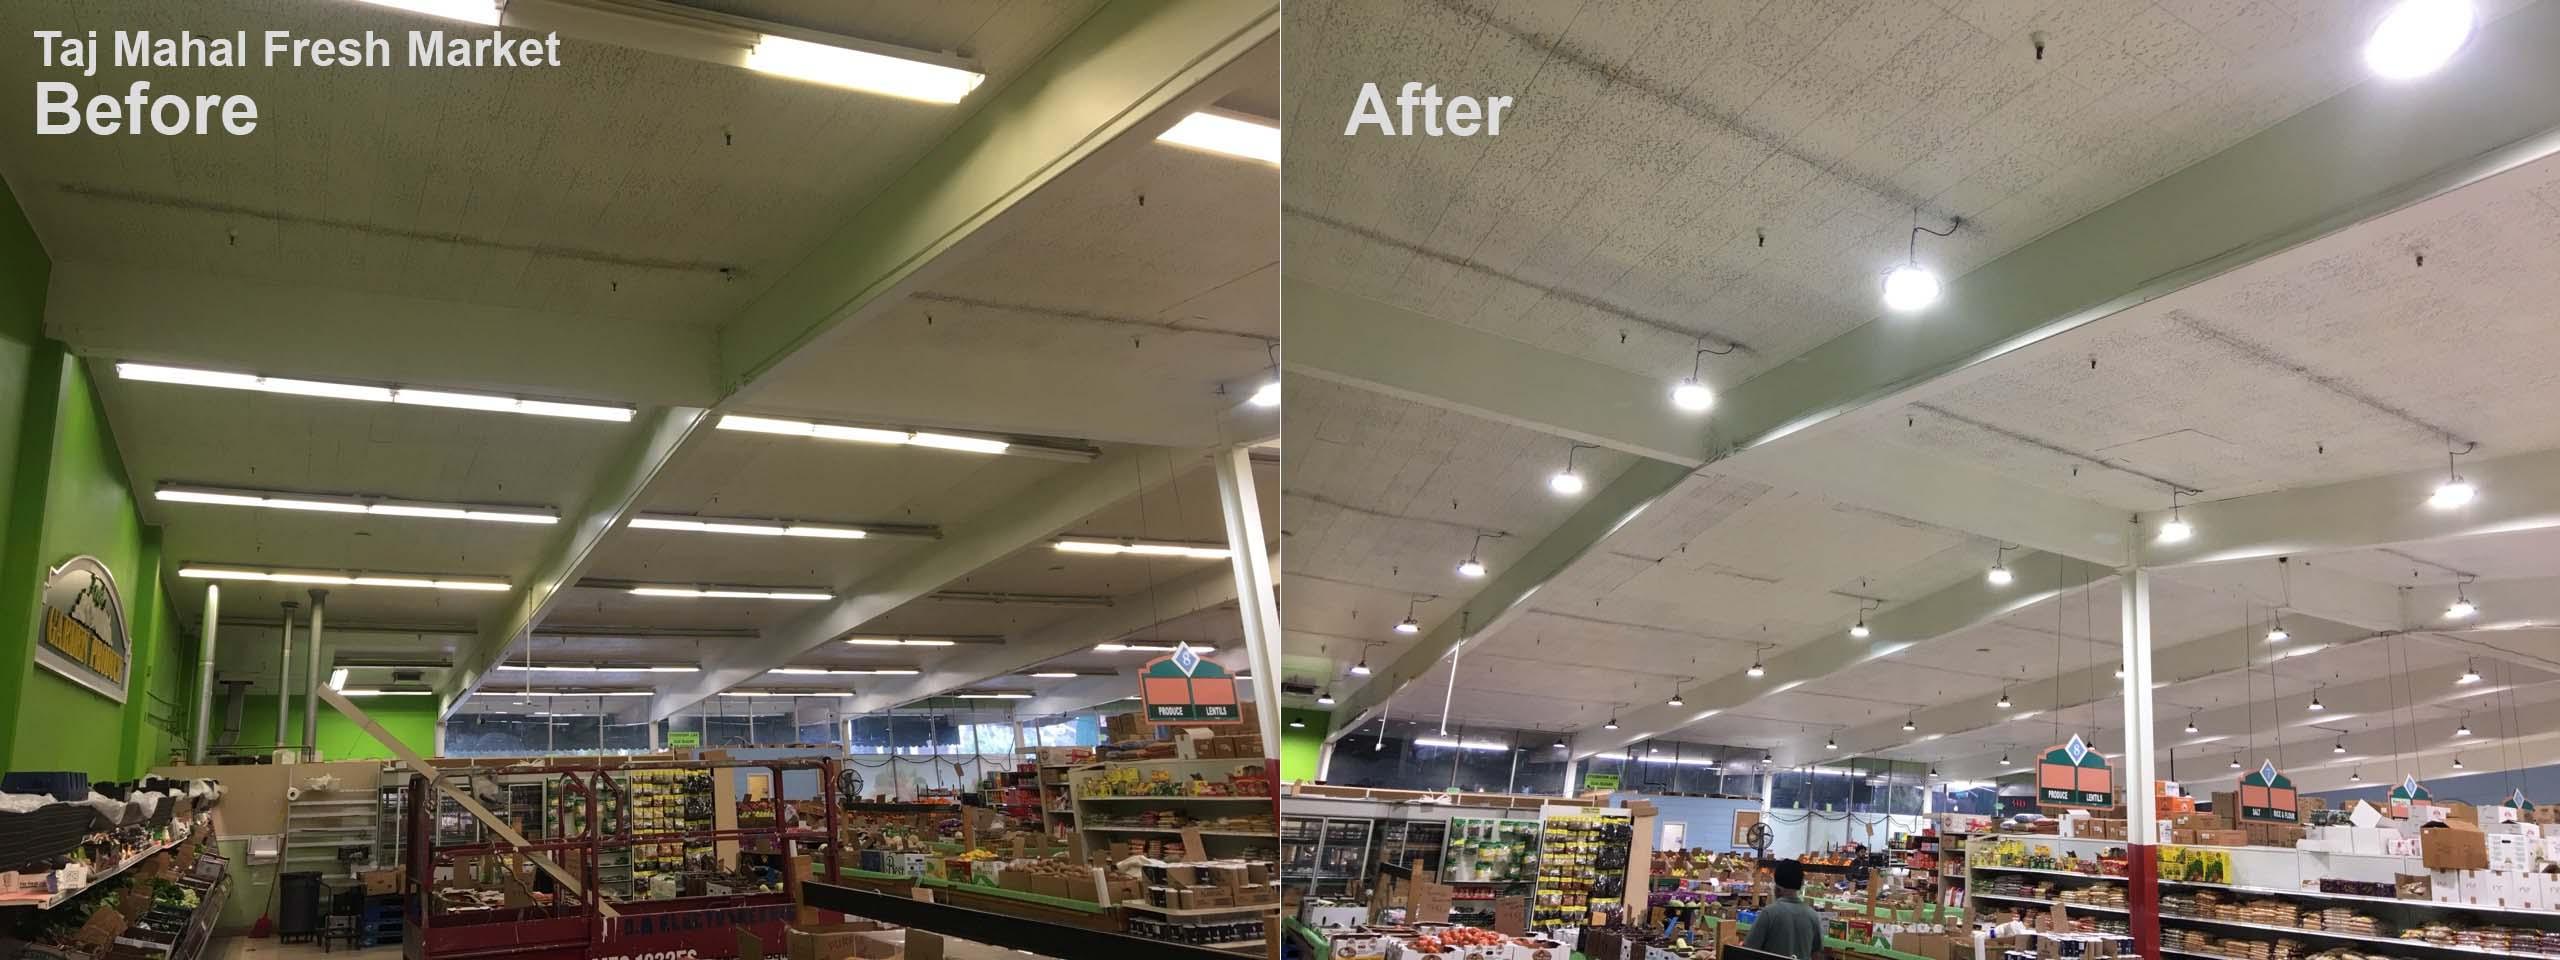 Supermarket Lighting Design Taj Mahal Fresh Market